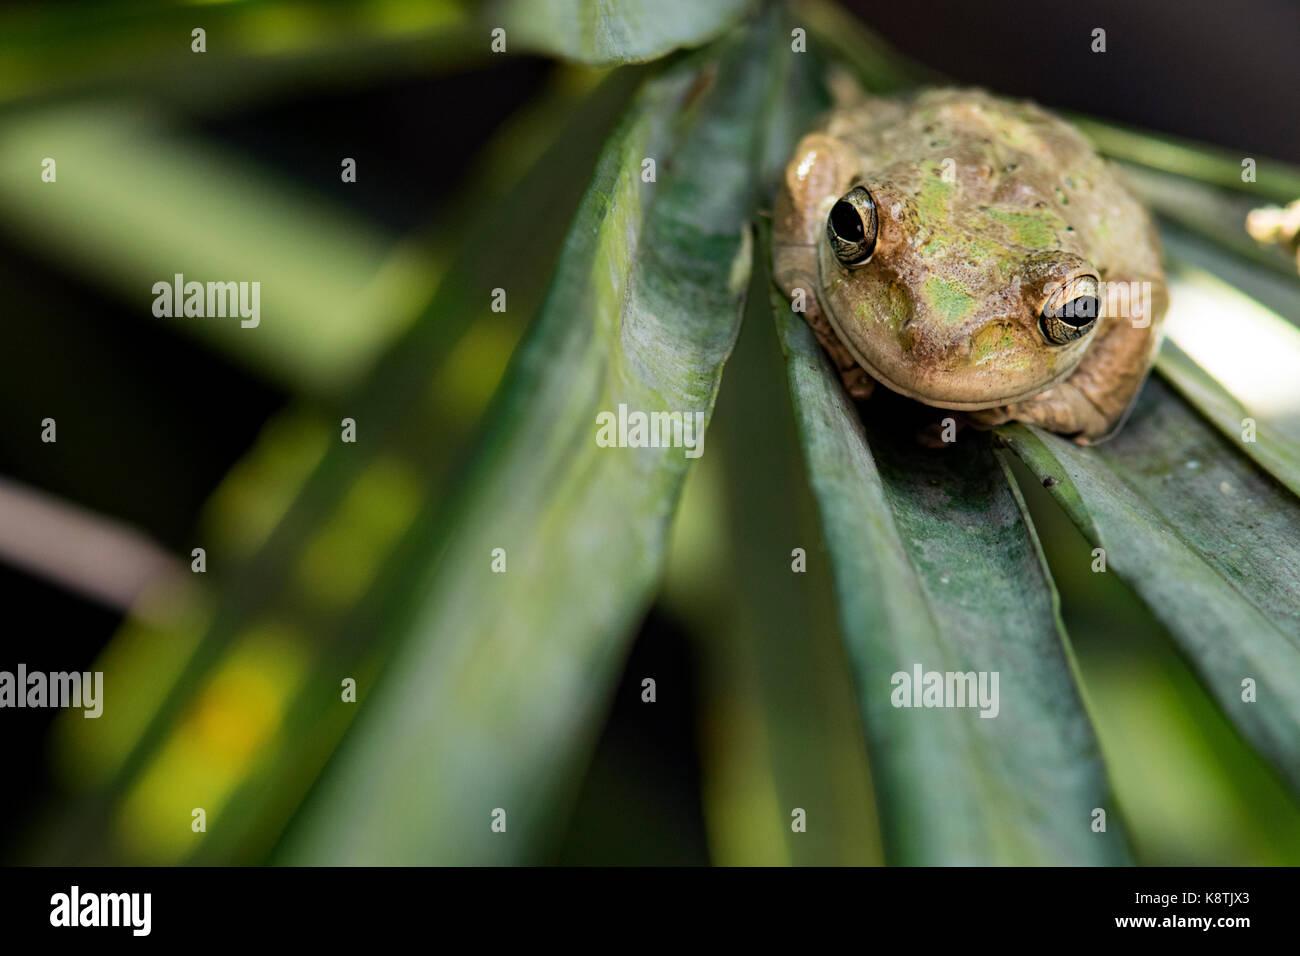 Cuban Treefrog - Green Cay Wetlands, Boynton Beach, Florida USA - Stock Image